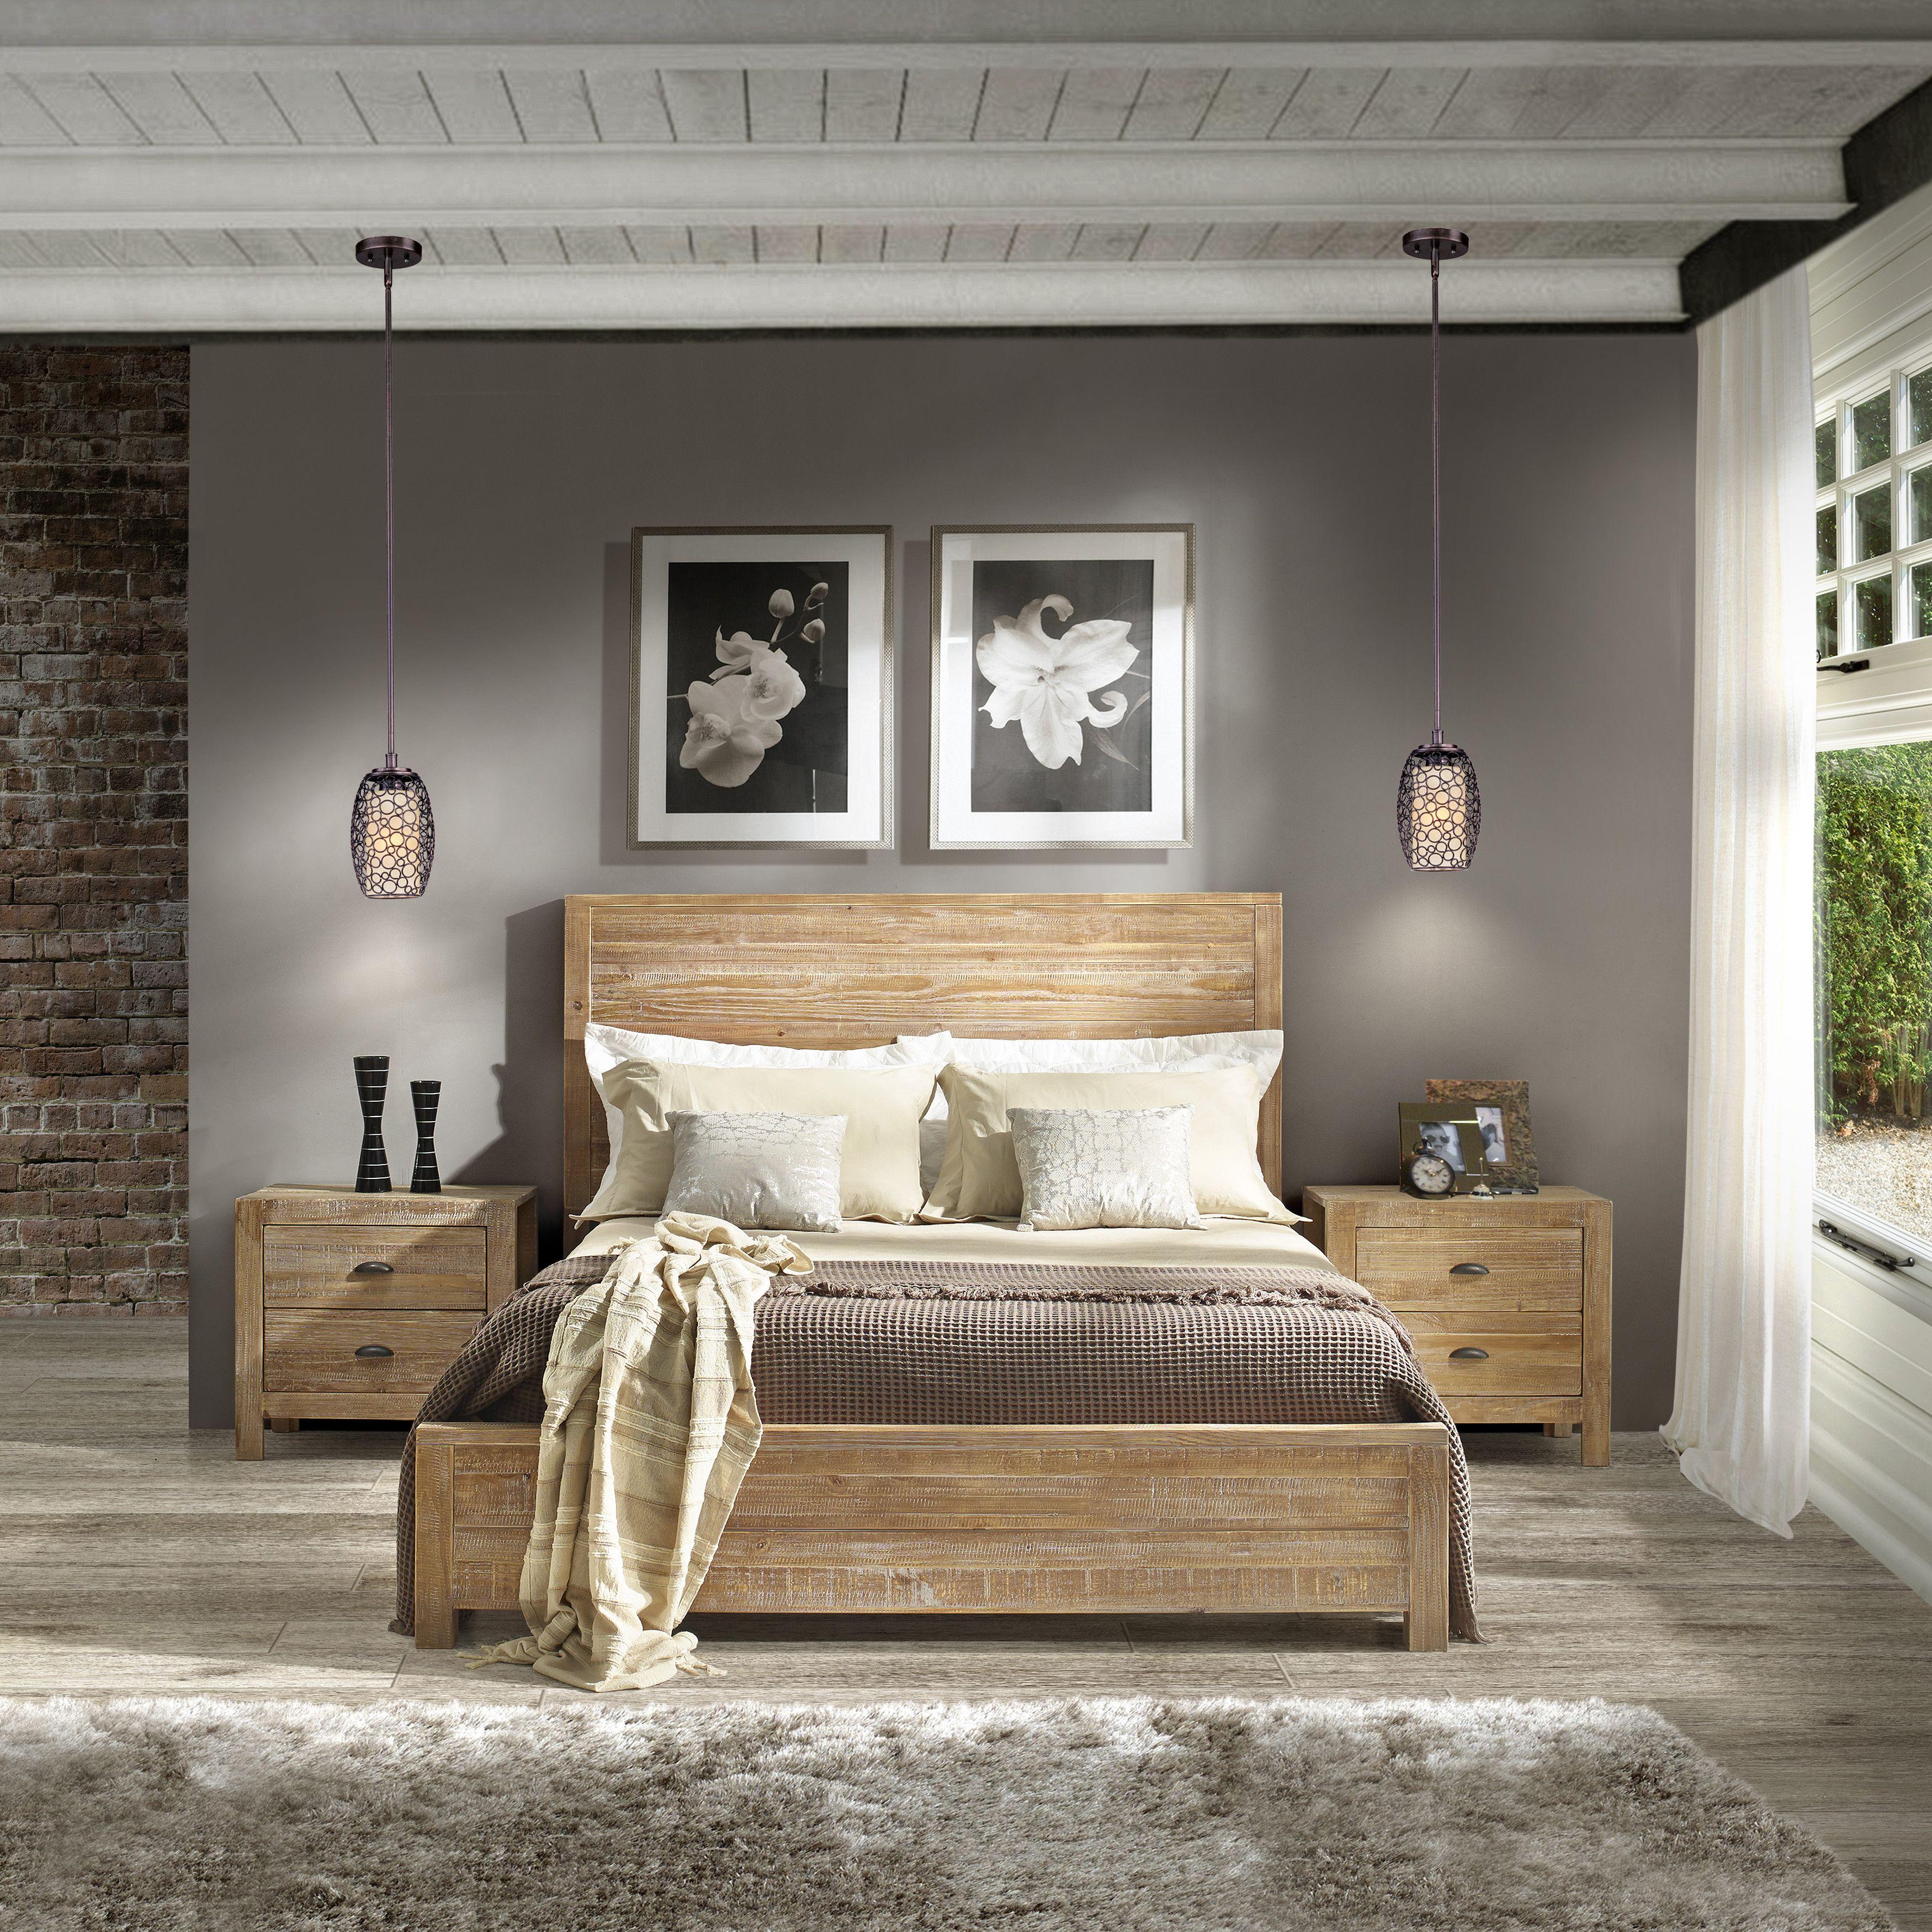 Shop For Beds Home Decoration Interior Design